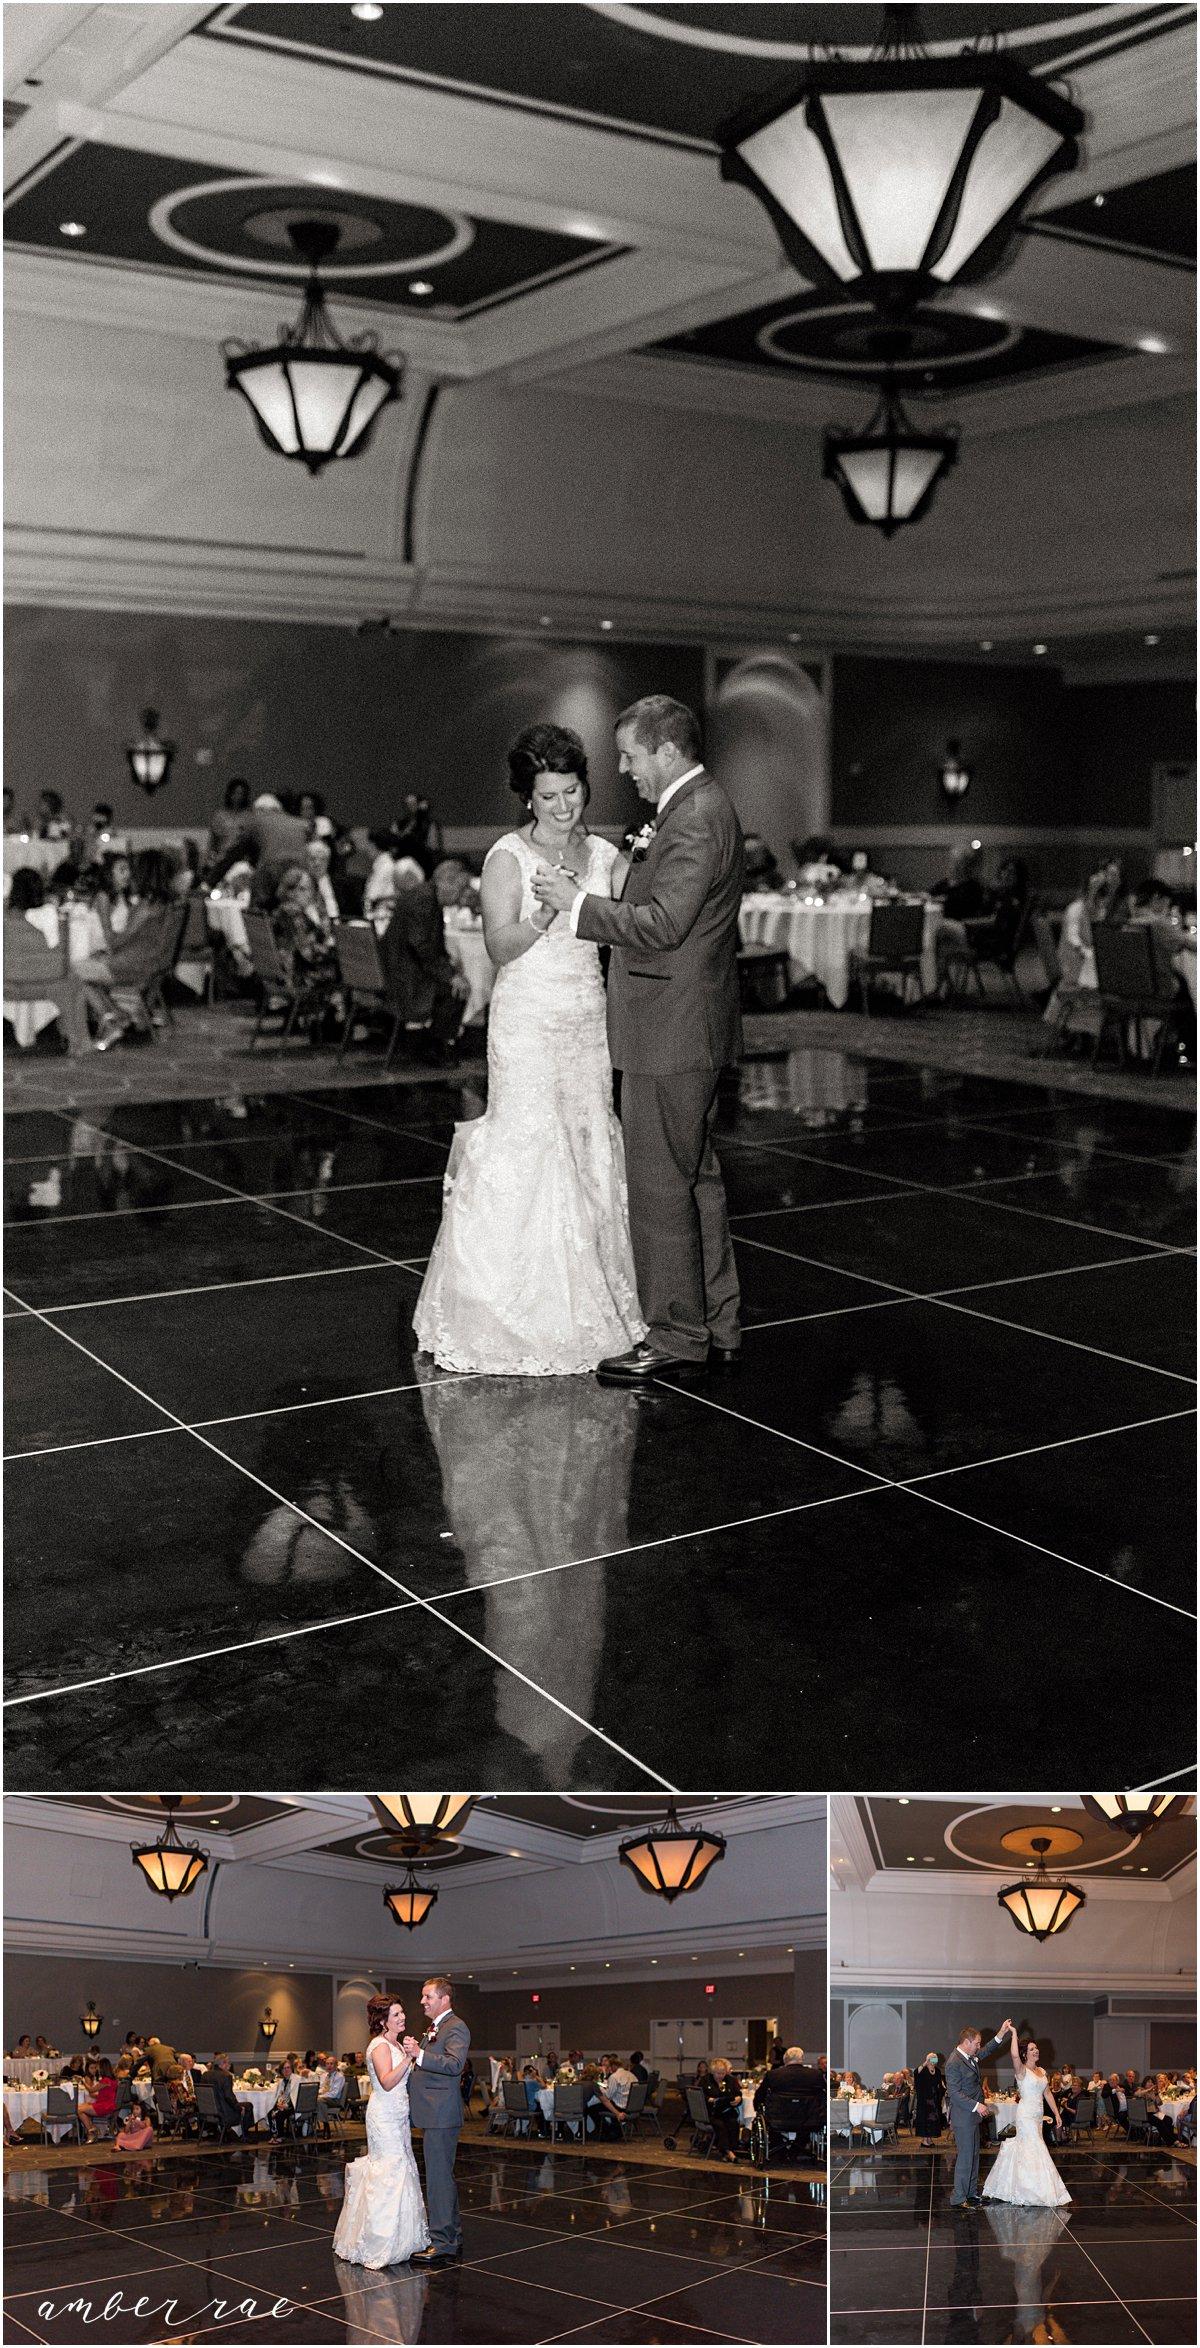 Gustafson Wedding 2018_0026.jpg